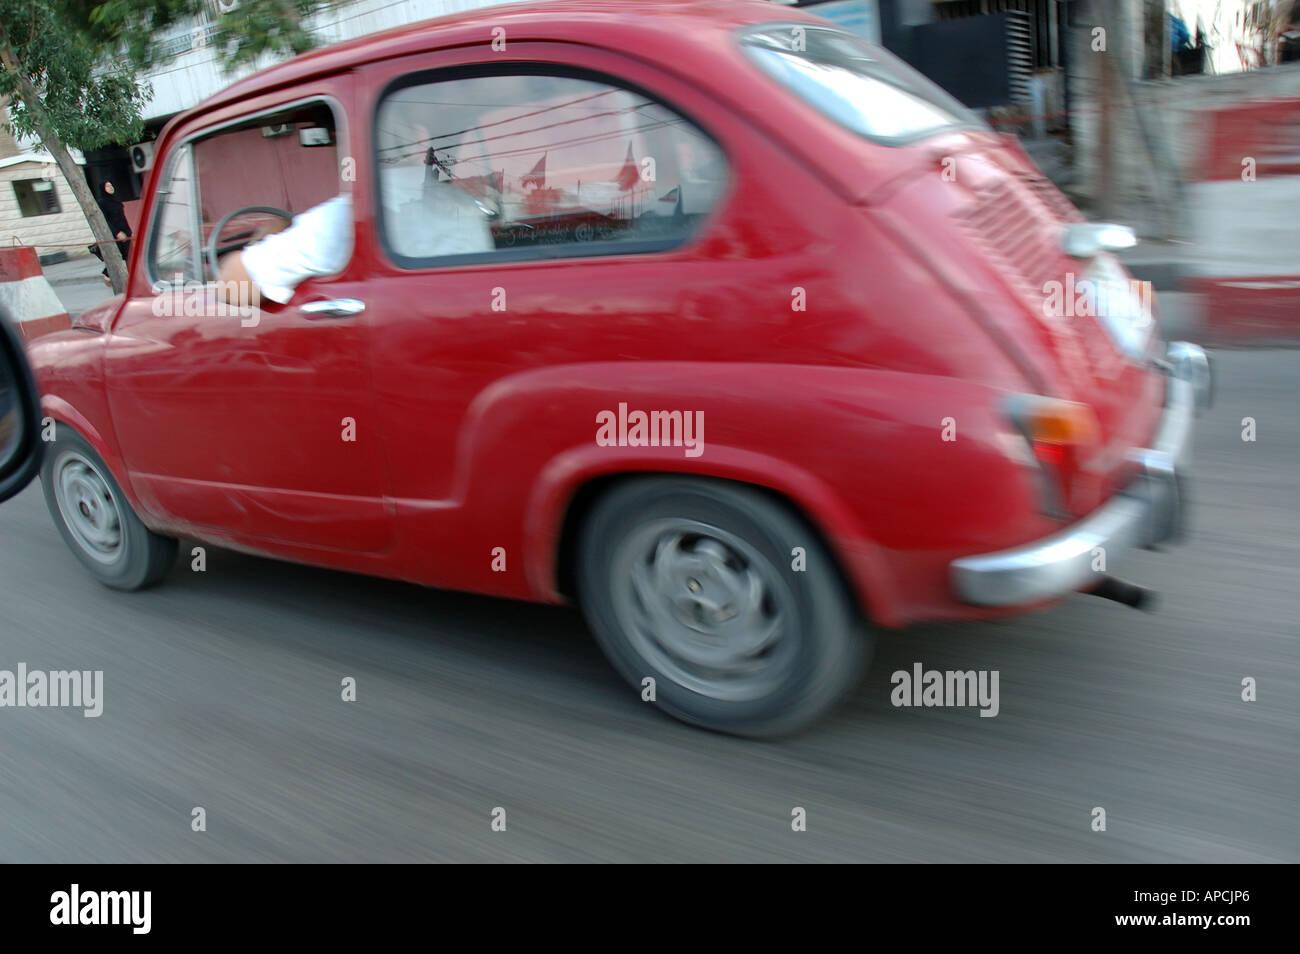 fiat 600 classic italian car beirut street lebanon - Stock Image